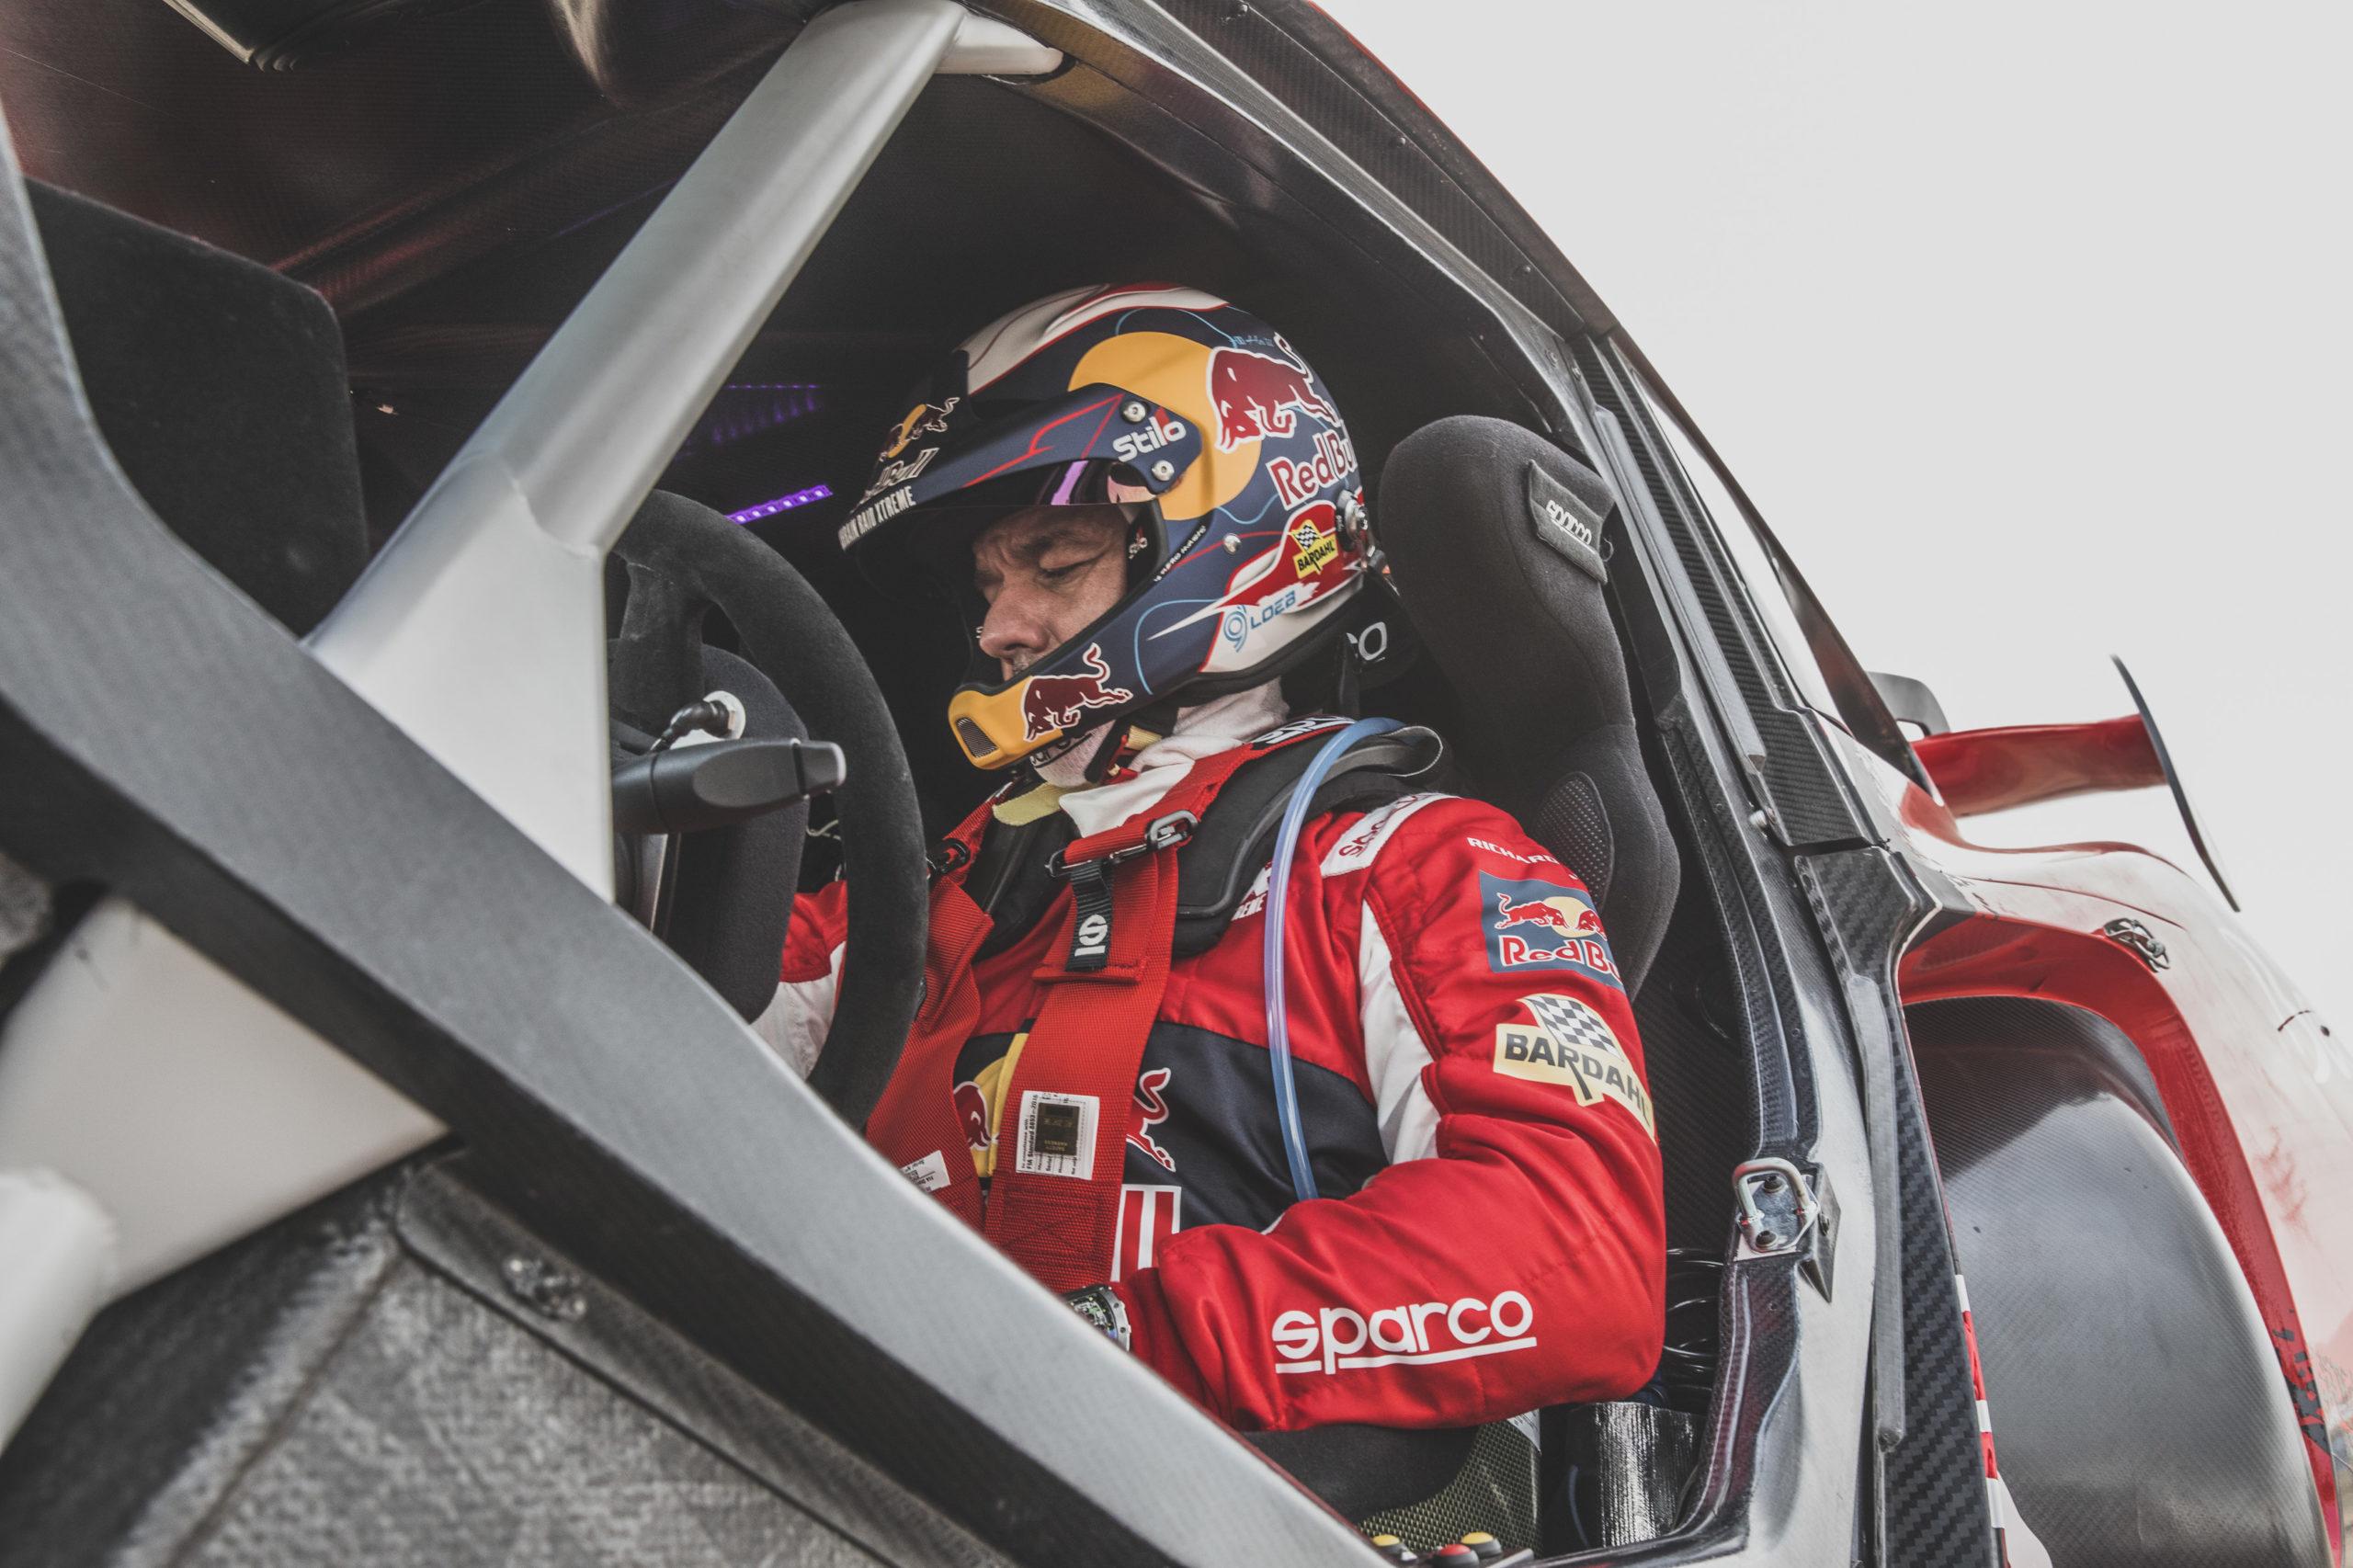 Sébastien Loeb (FRA) for Bahrain Raid XTreme seen during shakedown of Rally Dakar 2021 Djeddah, Saudi Arabia on December 31, 2020. // Flavien Duhamel/Red Bull Content Pool // SI202012310115 // Usage for editorial use only //